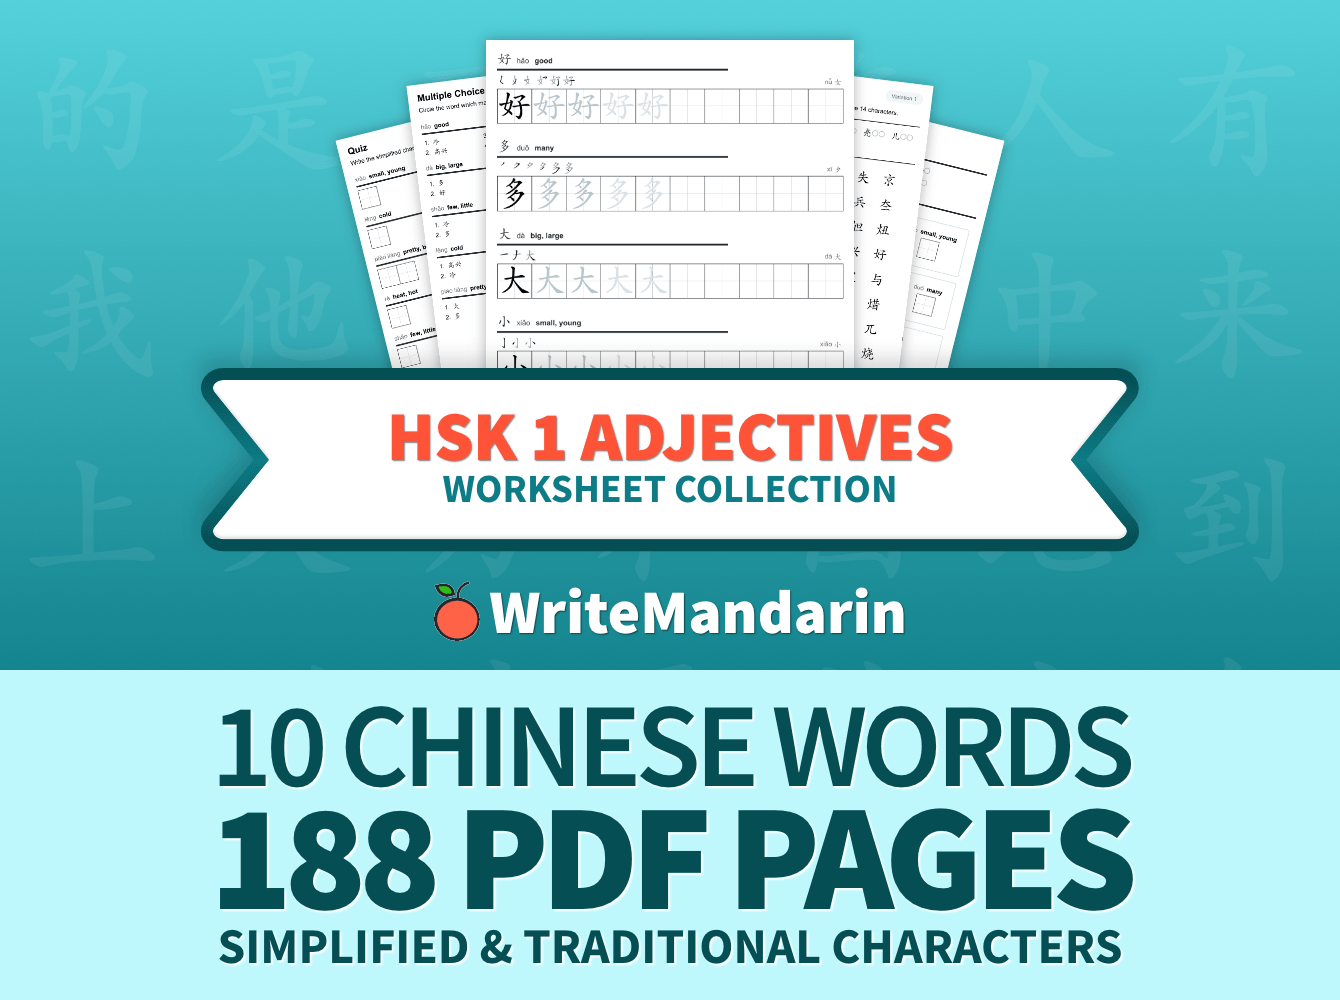 Hsk 1 Adjectives